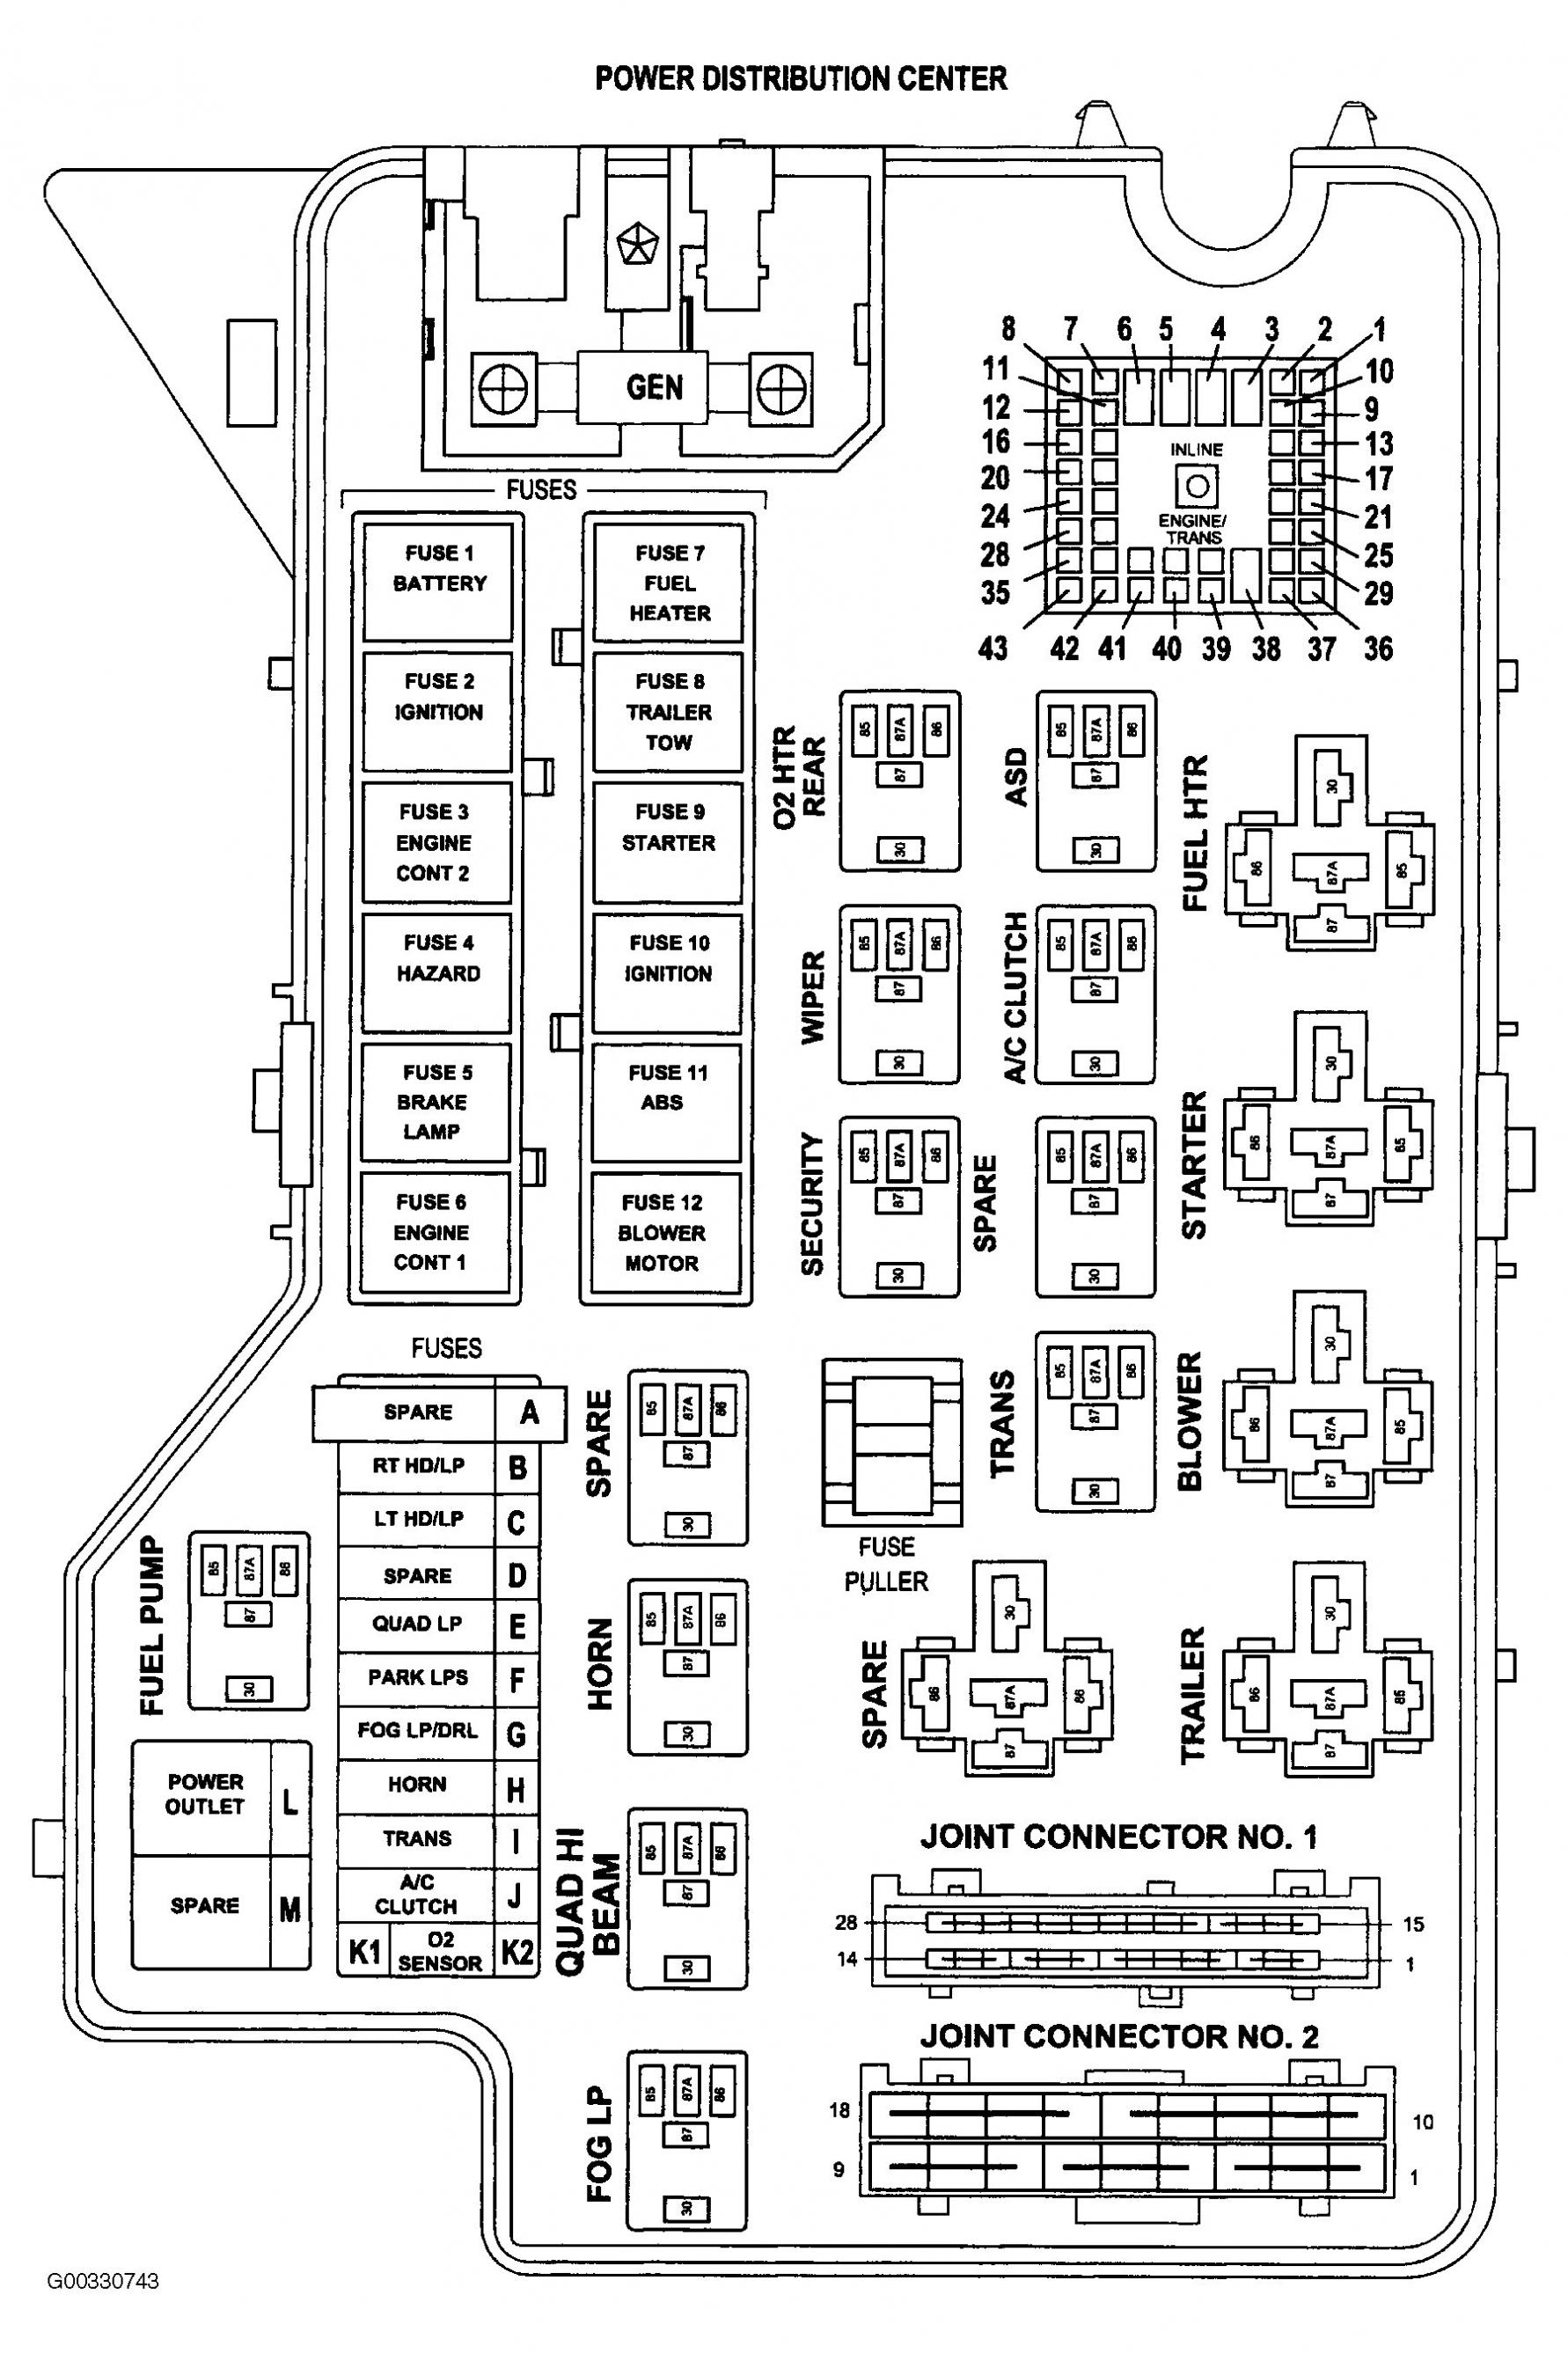 Ram 1500 Fuse Box - Wiring Diagram Data - 2004 Dodge Ram 1500 Wiring Diagram